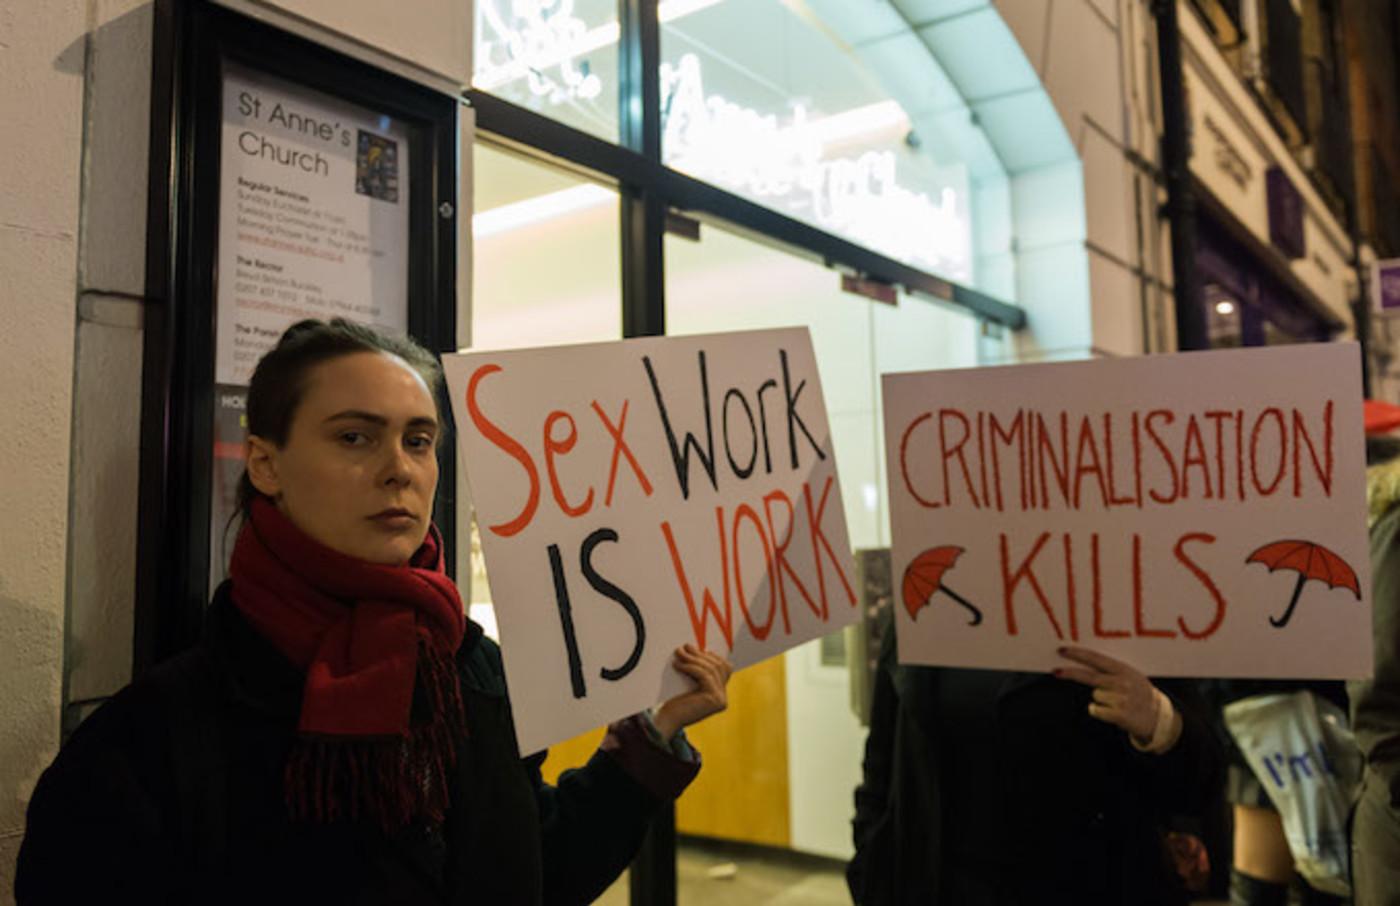 Sex work legalization signs